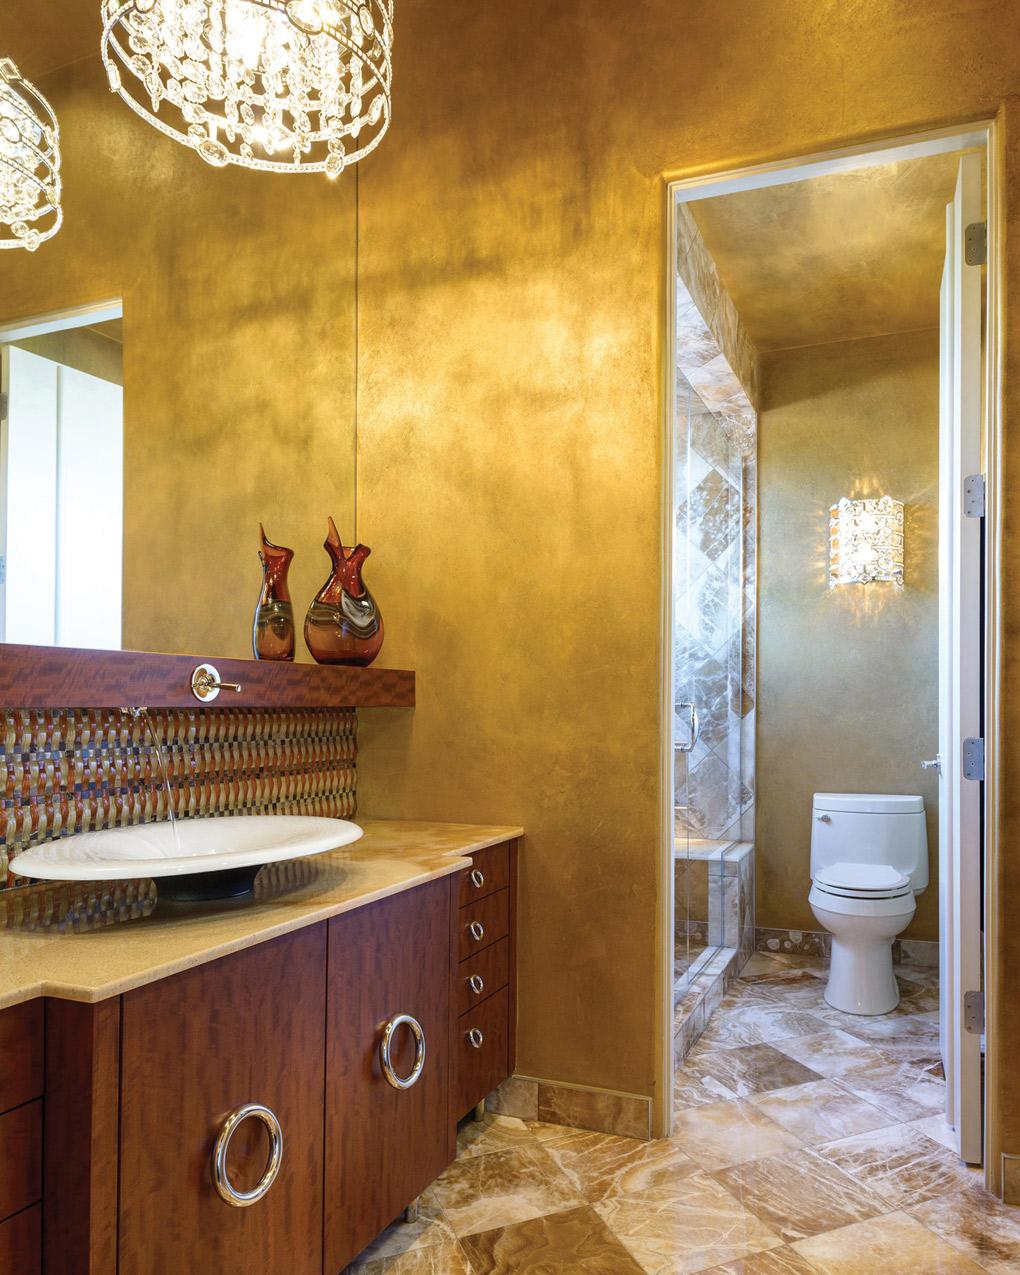 2014 National Kitchen And Bath Association Design Awards